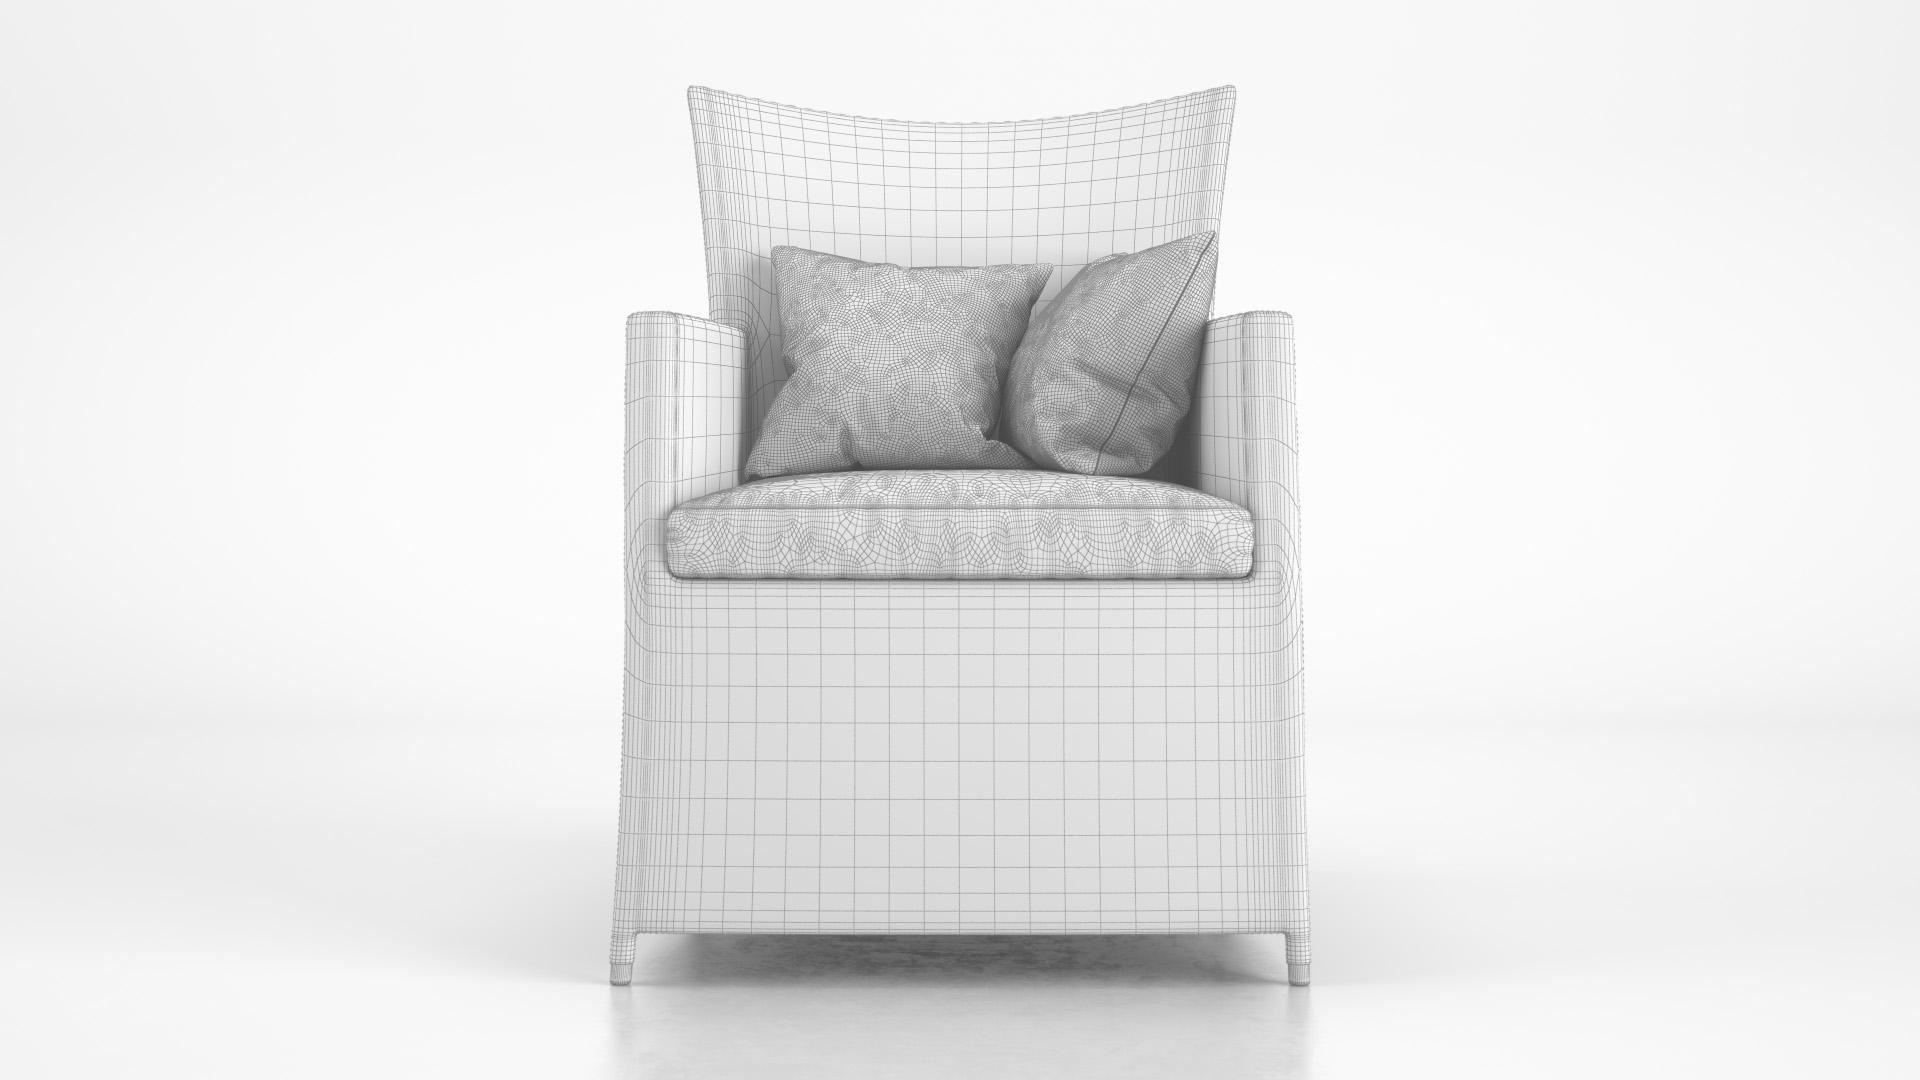 U-zit_Chair_CF-21-DB_WhiteSet_01_wire_0001